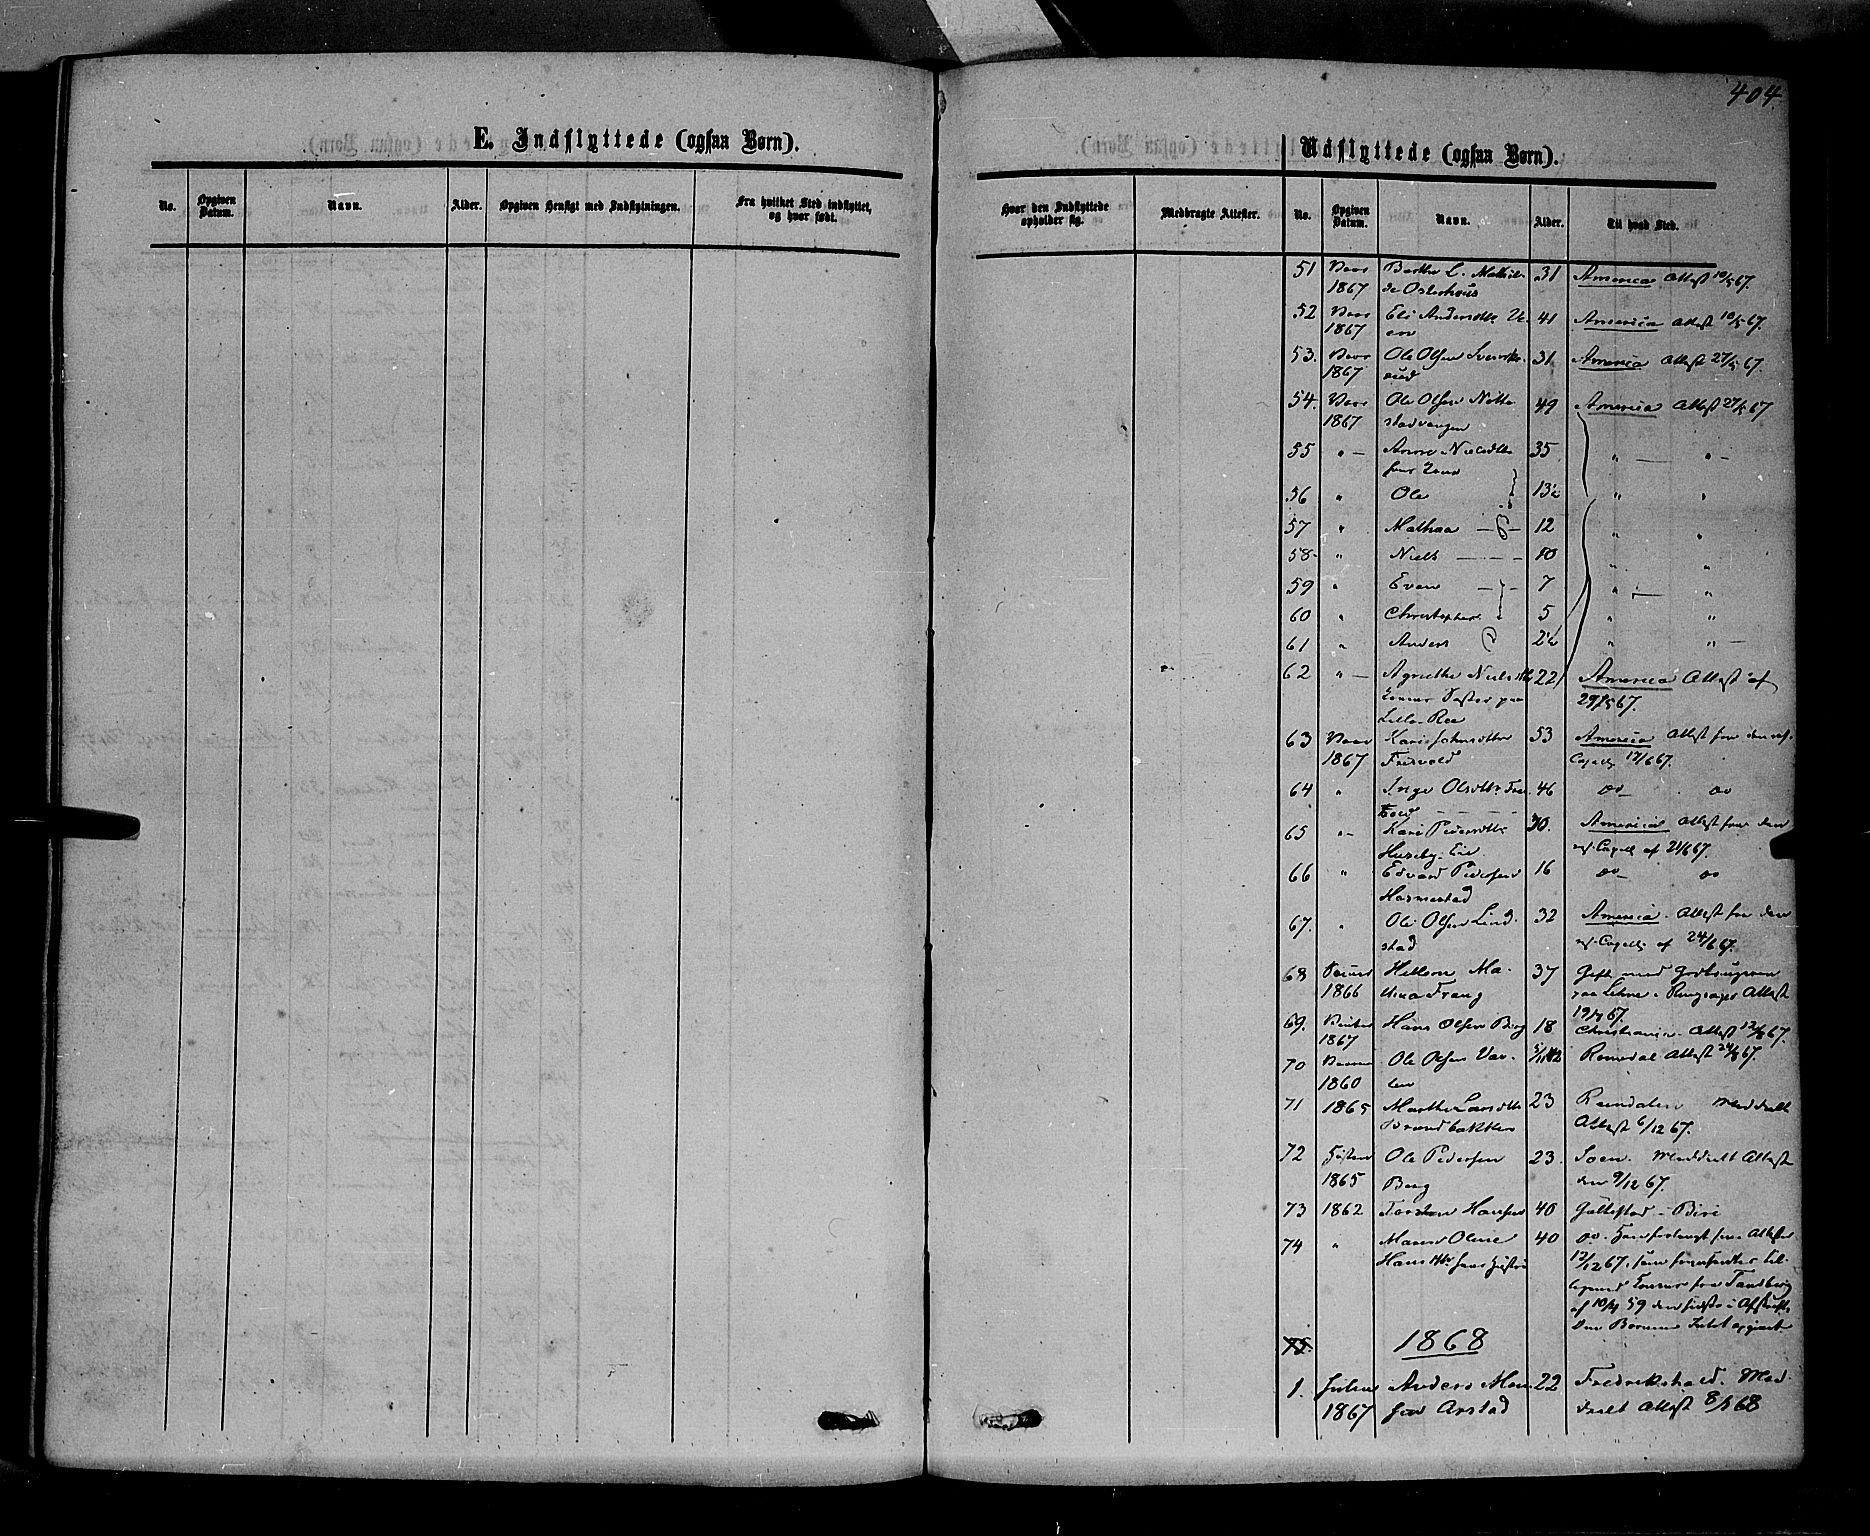 SAH, Stange prestekontor, K/L0013: Ministerialbok nr. 13, 1862-1879, s. 404